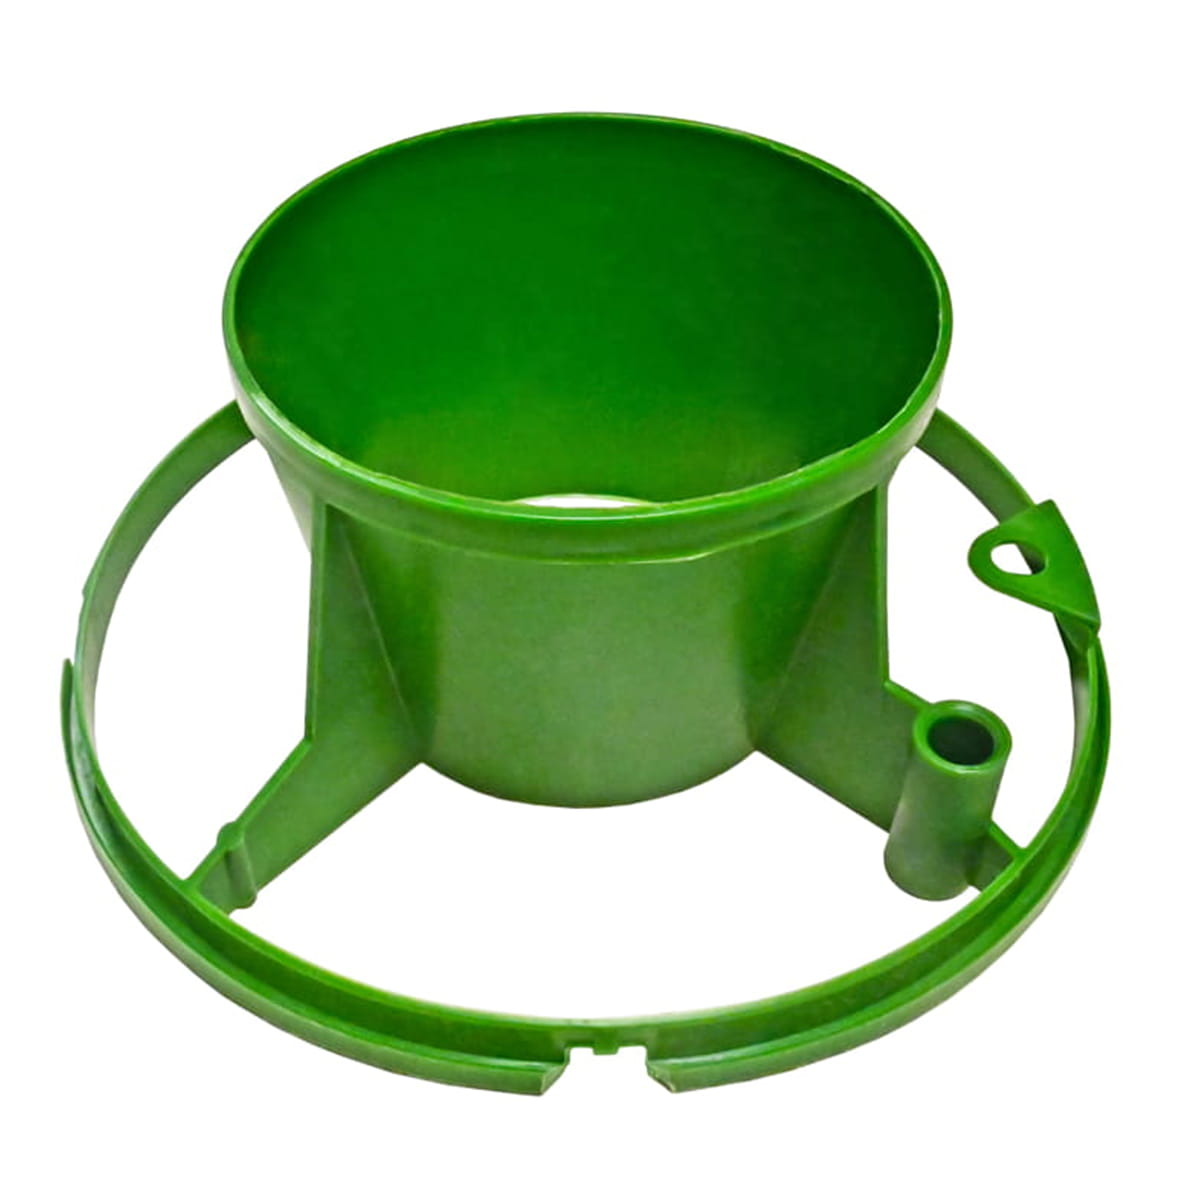 cono superior clutch verde